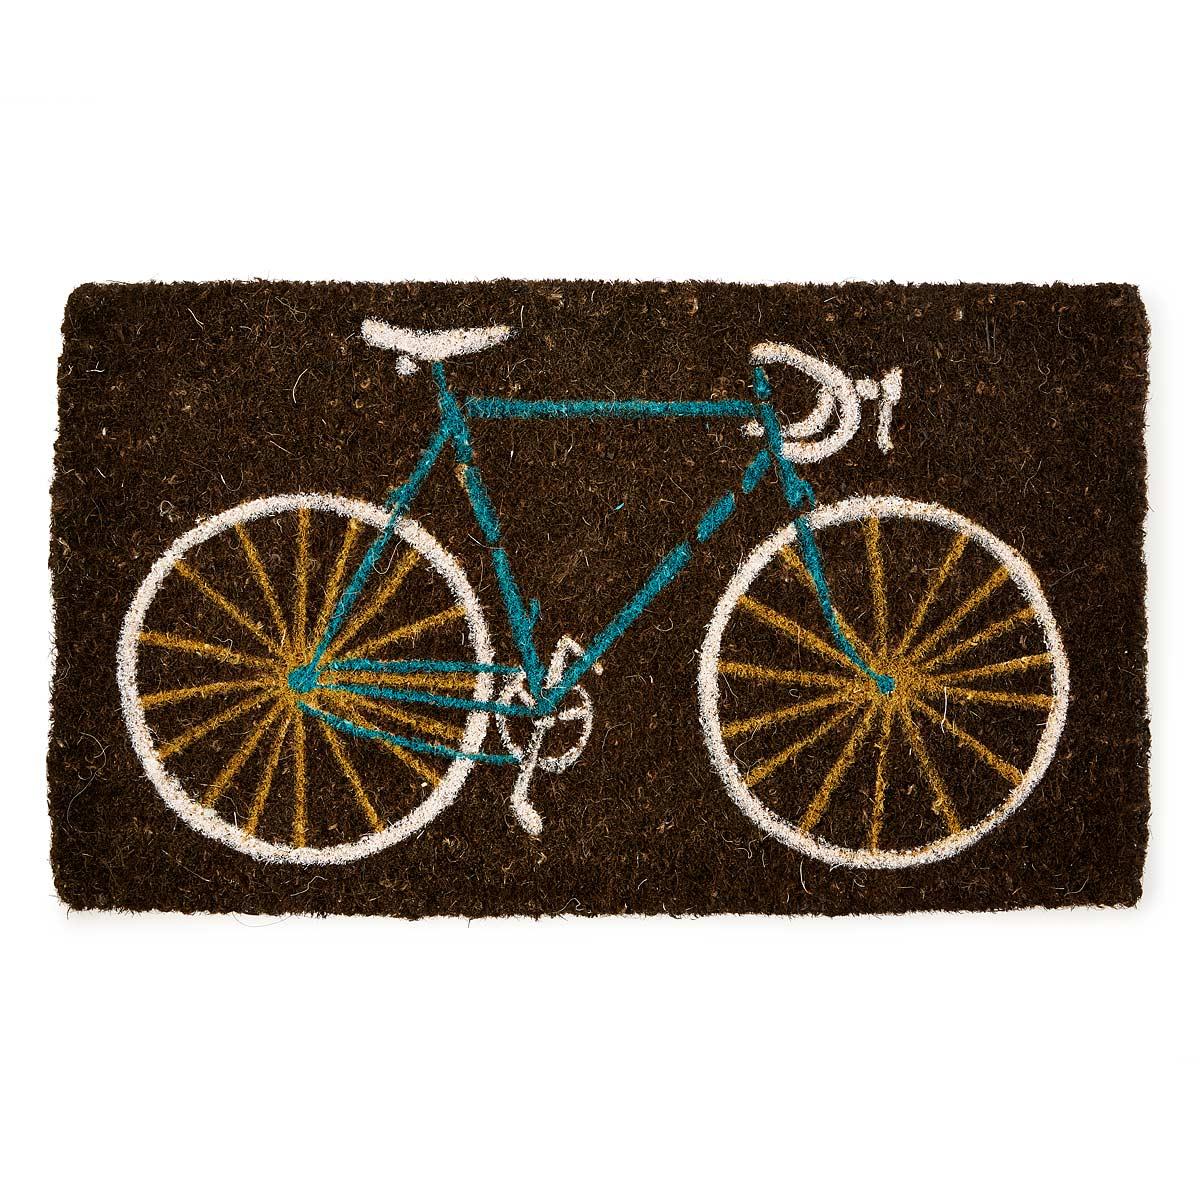 Bike Doormat 1 thumbnail  sc 1 st  UncommonGoods & Bike Doormat | bike doormat bicycle home decor coconut fiber ...